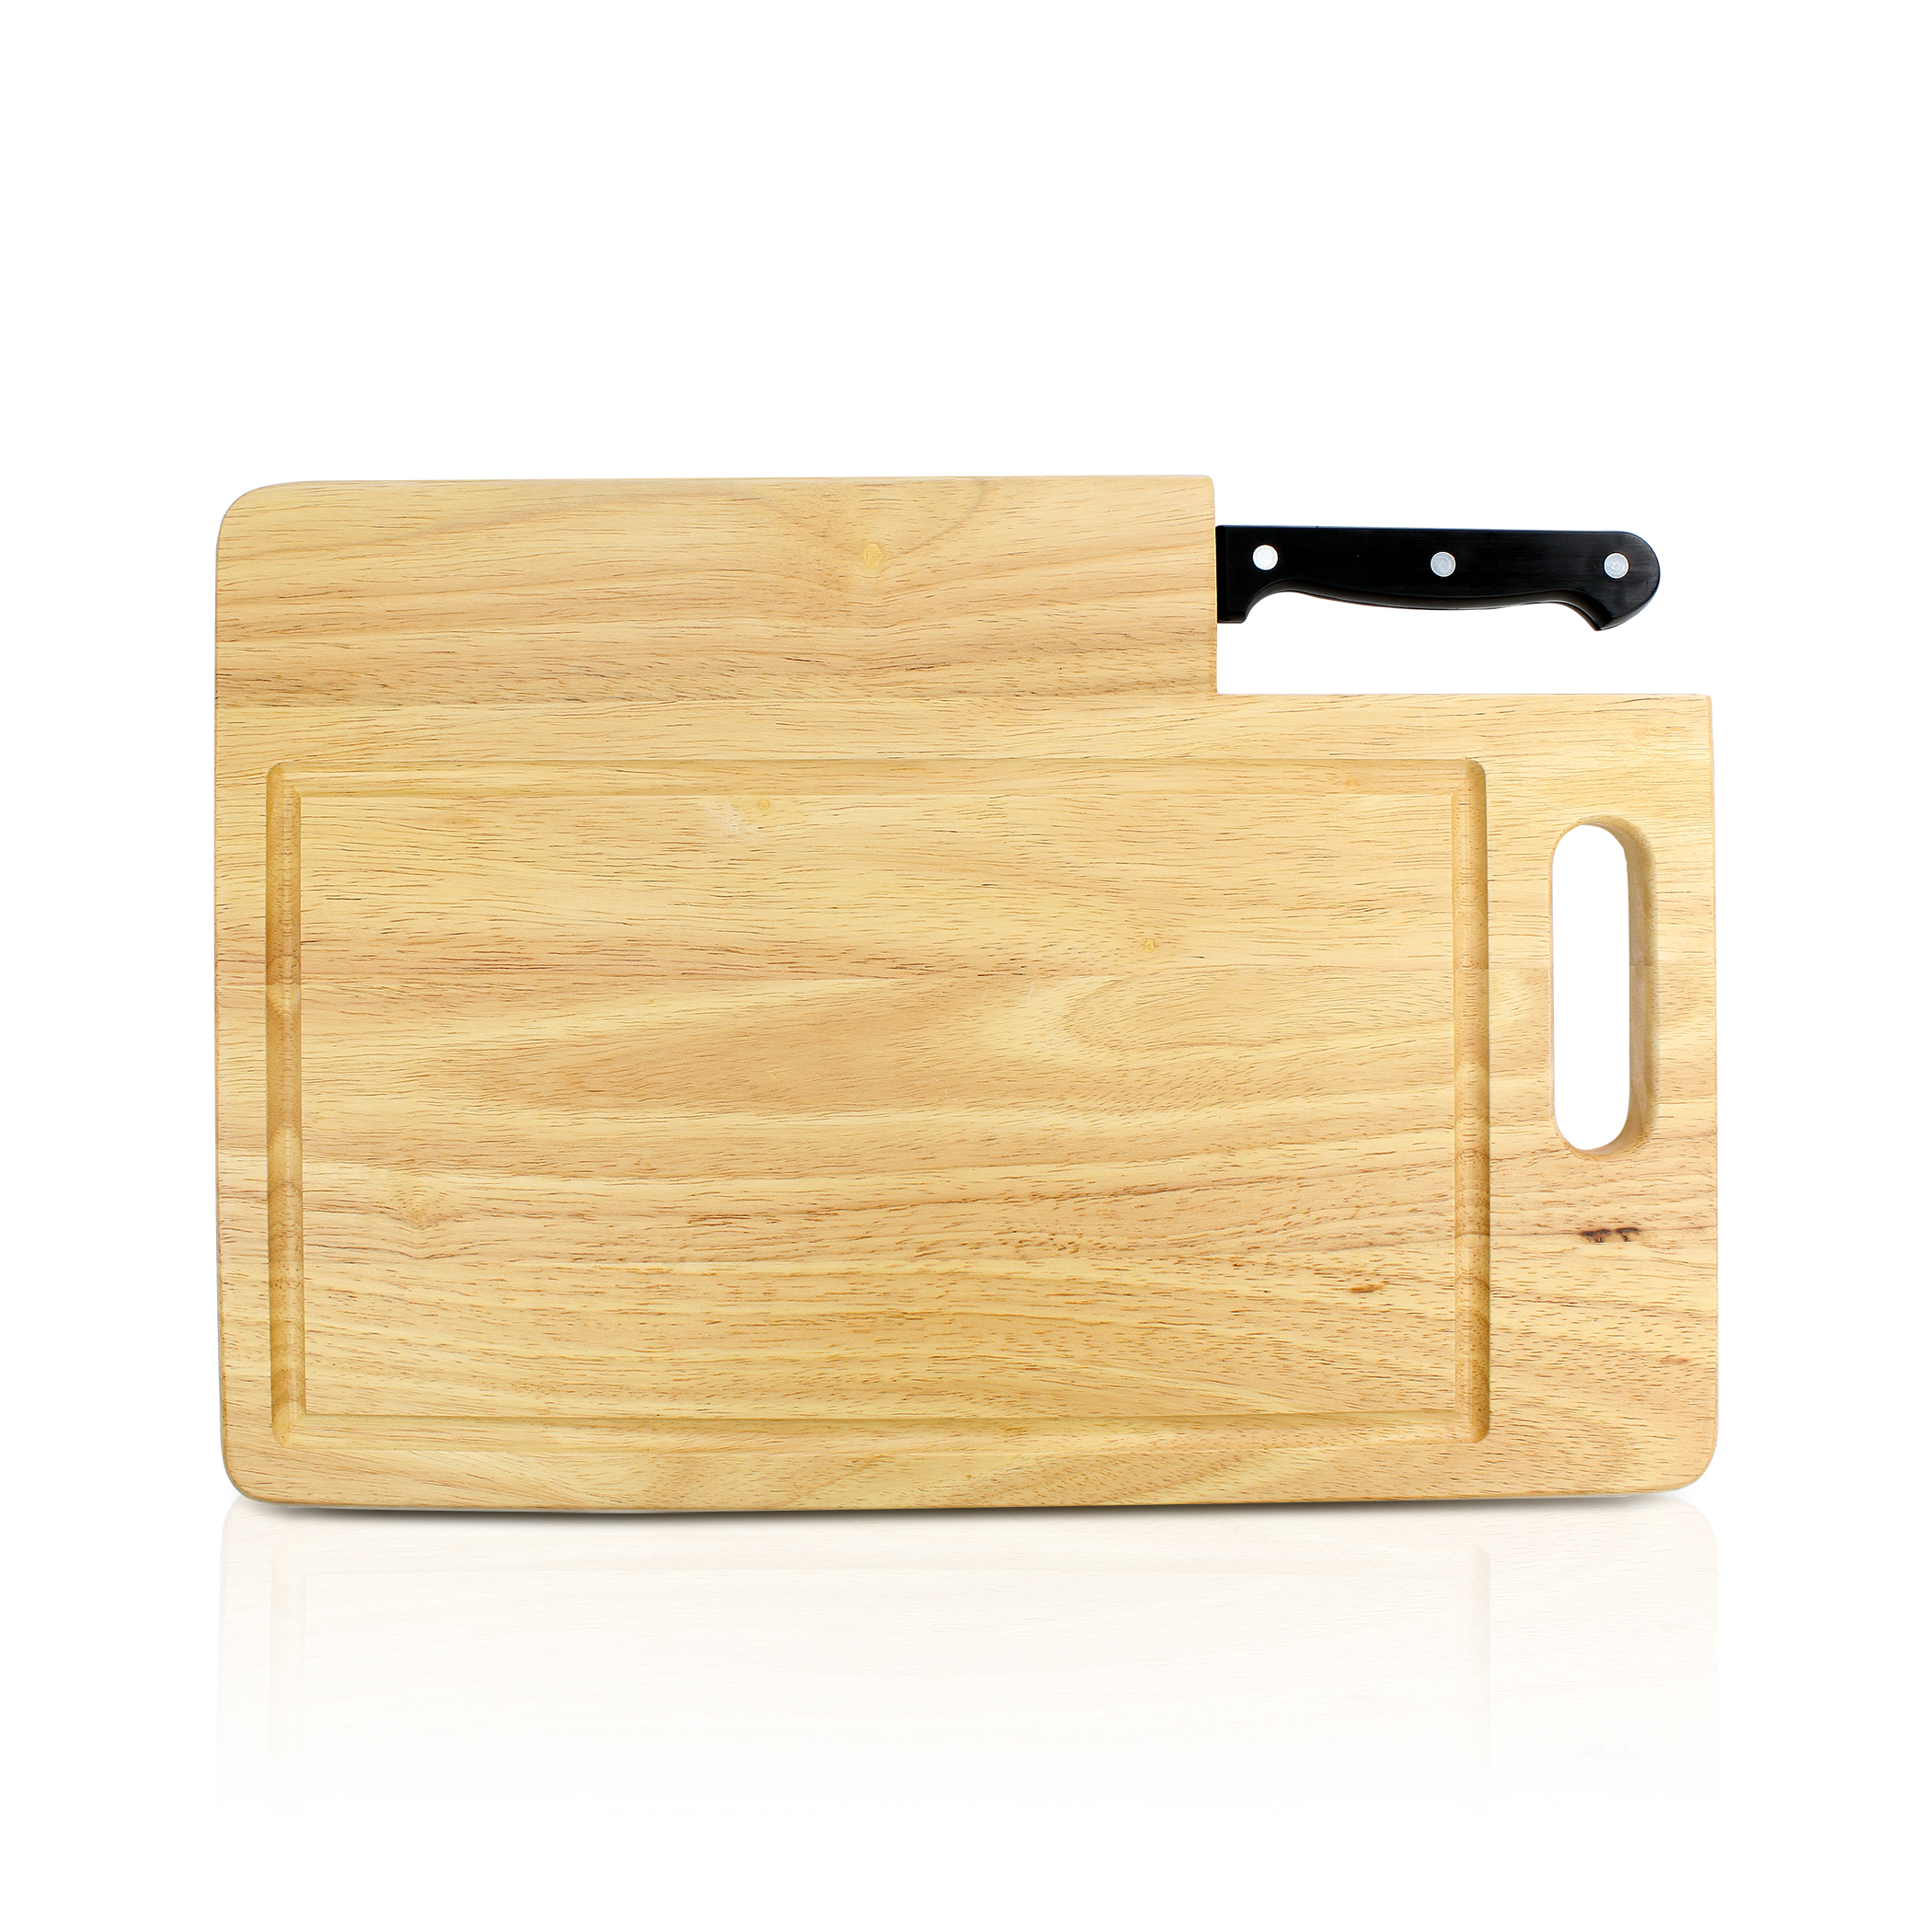 Ginsu Essential Series: Santoku Knife with Cutting Board, GES-KB-DS-002-3